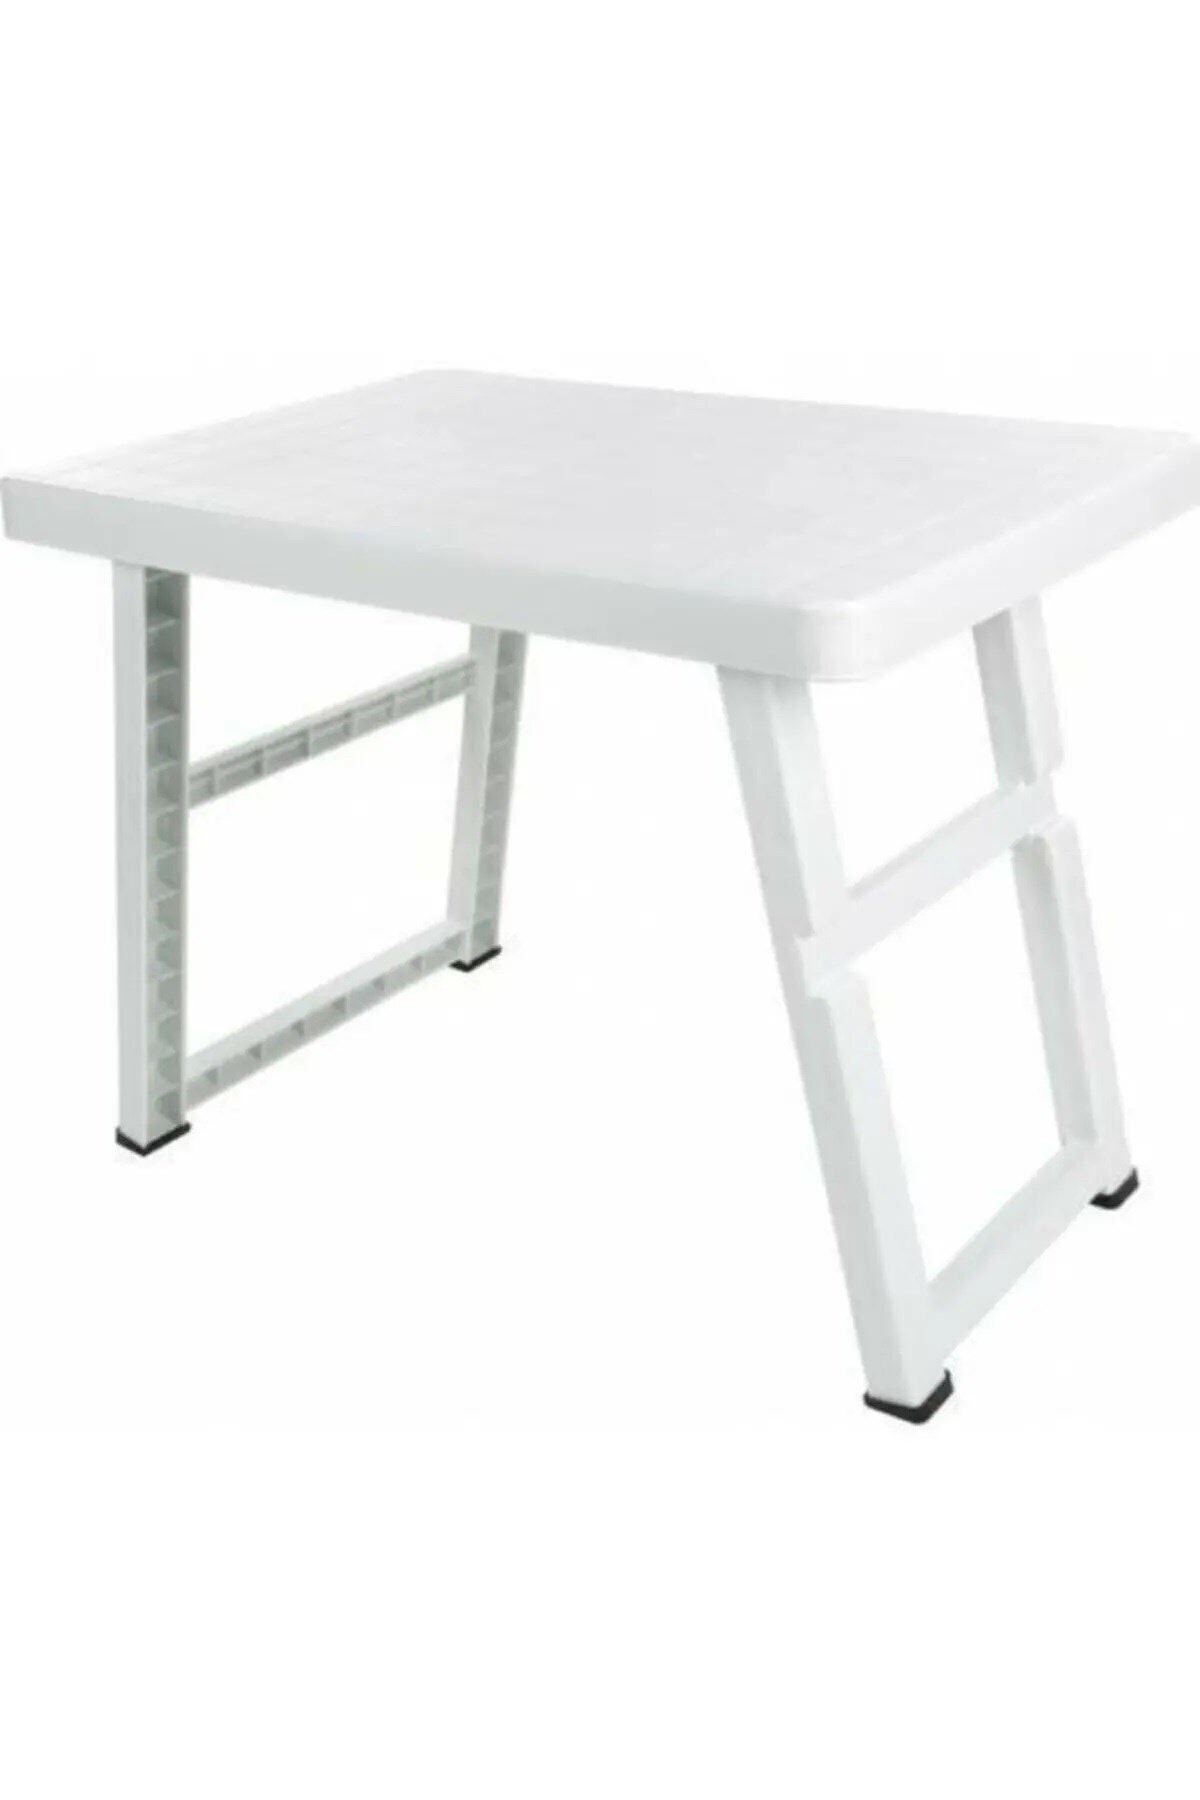 Portatif Katlanabilir Büyük Boy Masa Piknik Masası 70 X 47 X 56 Cm